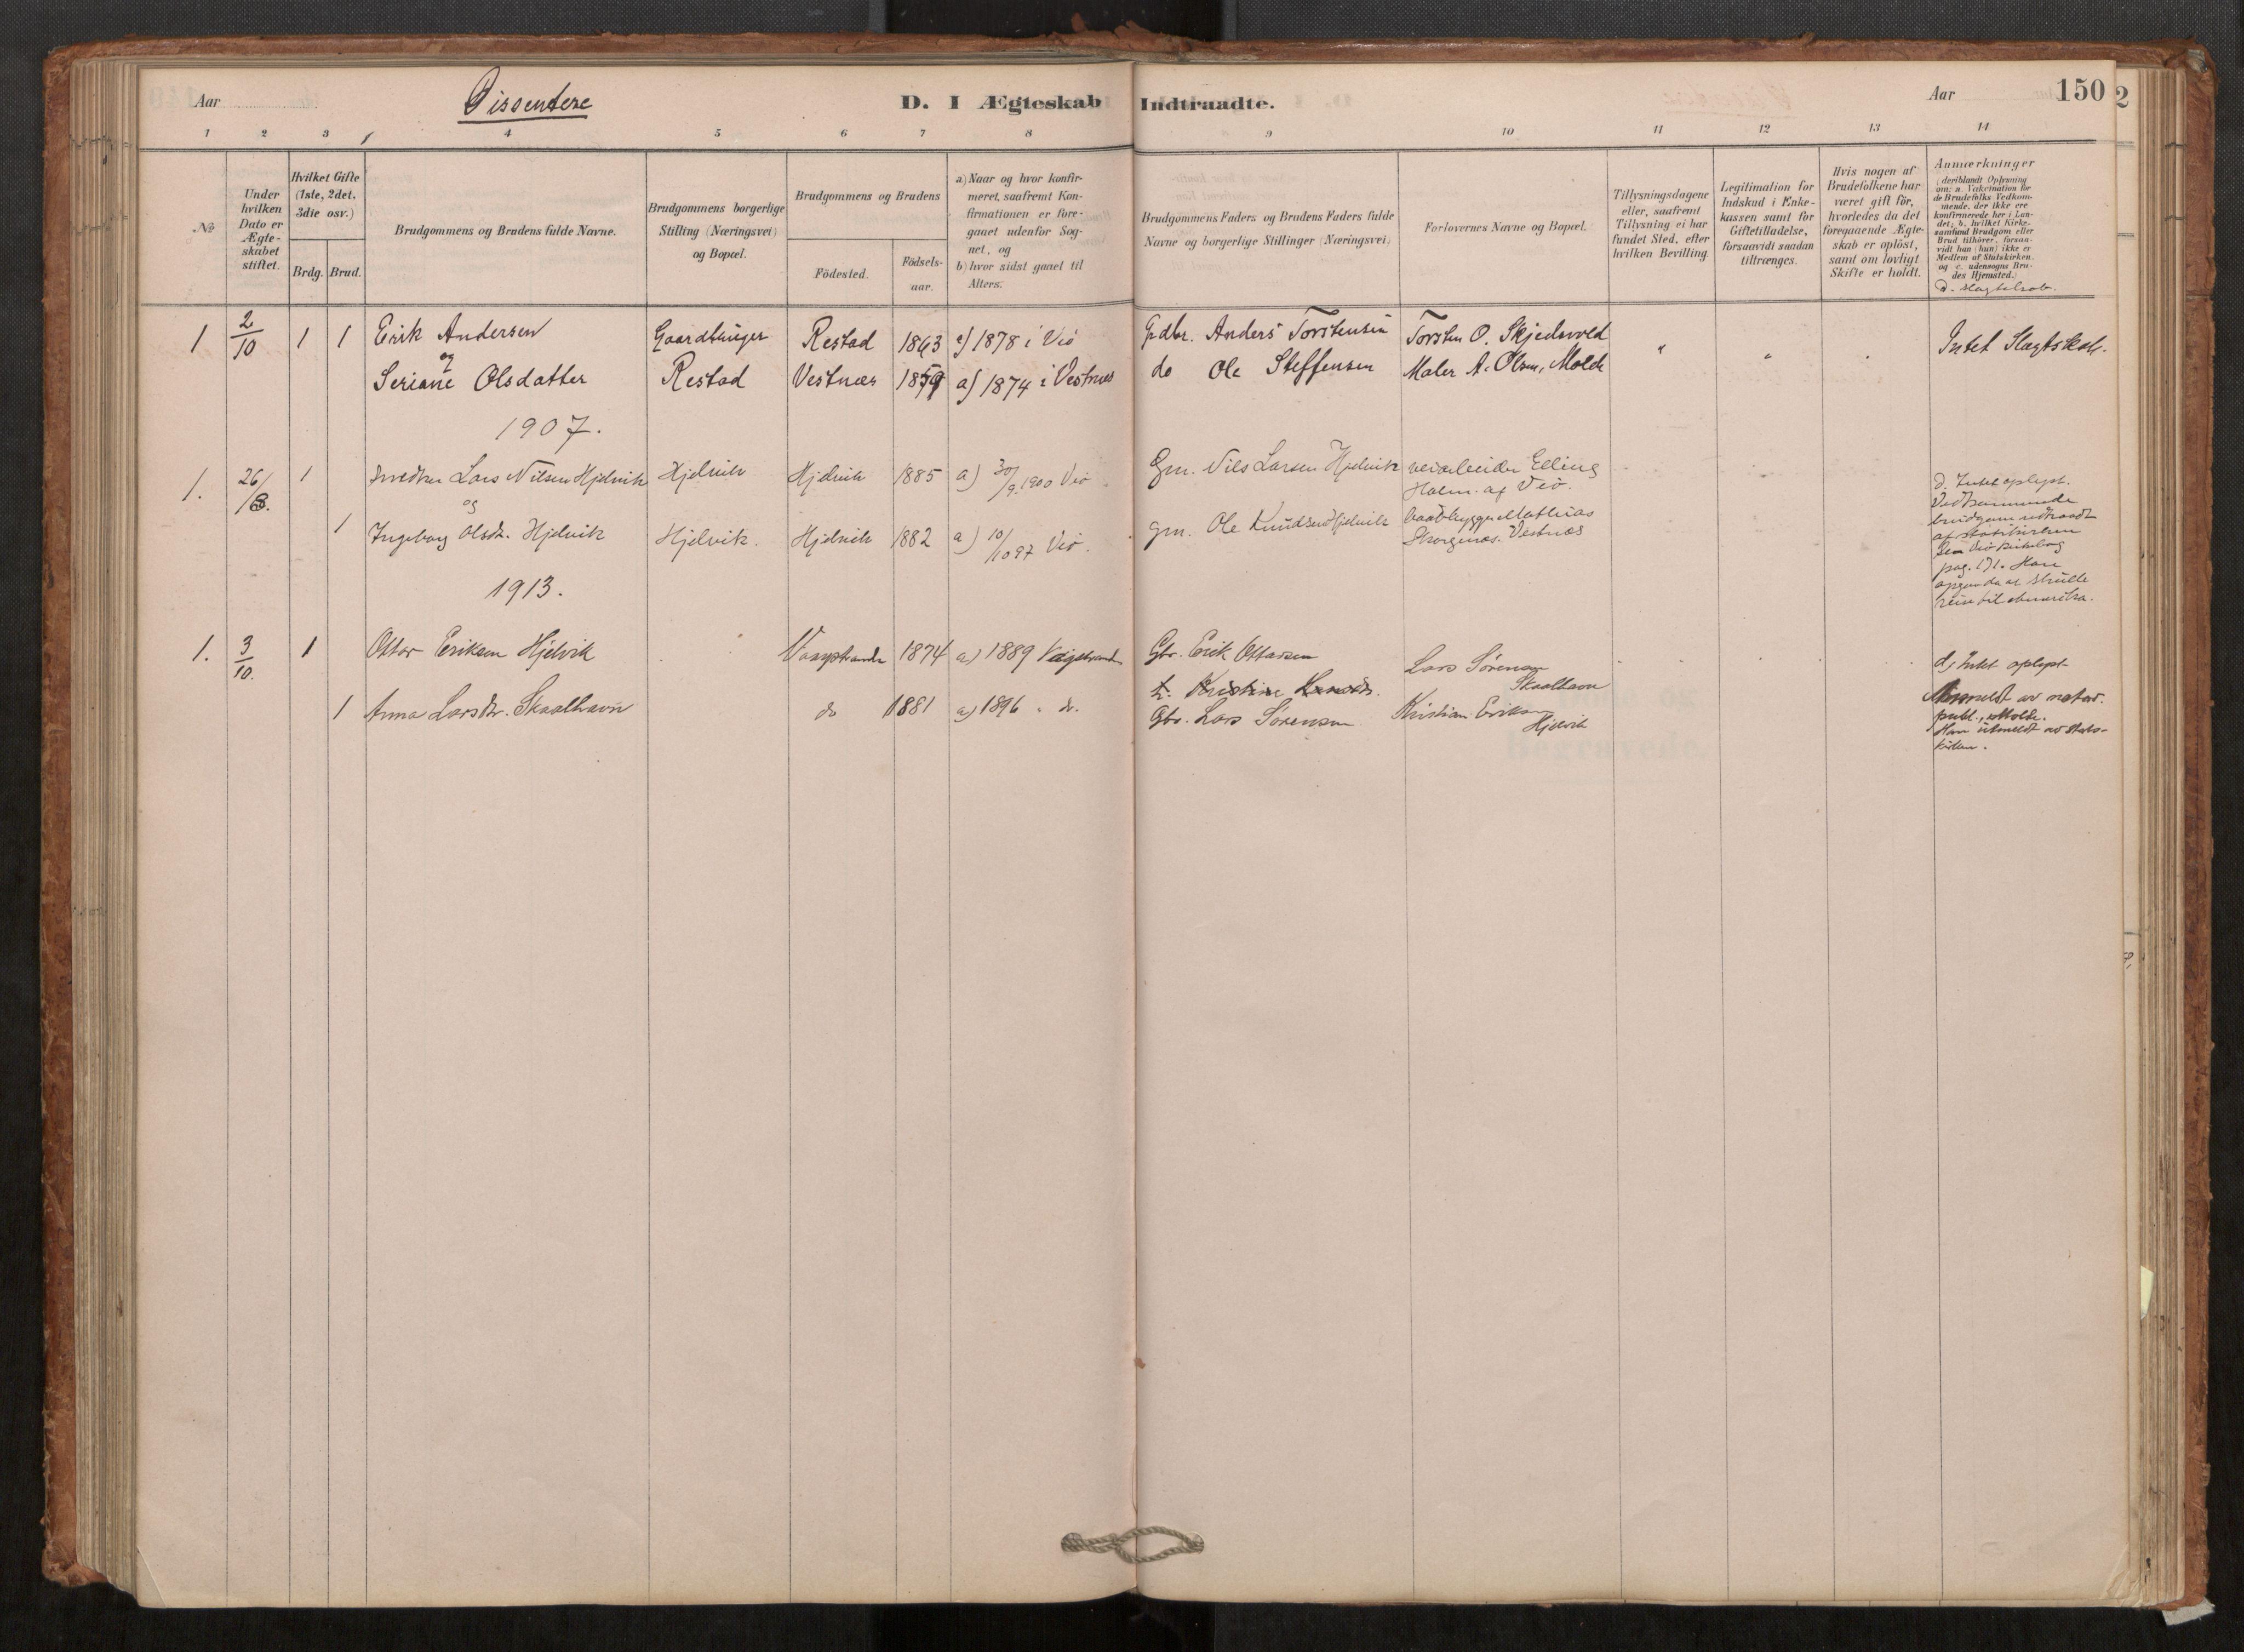 SAT, Grytten sokneprestkontor, Ministerialbok nr. 550A01, 1878-1915, s. 150